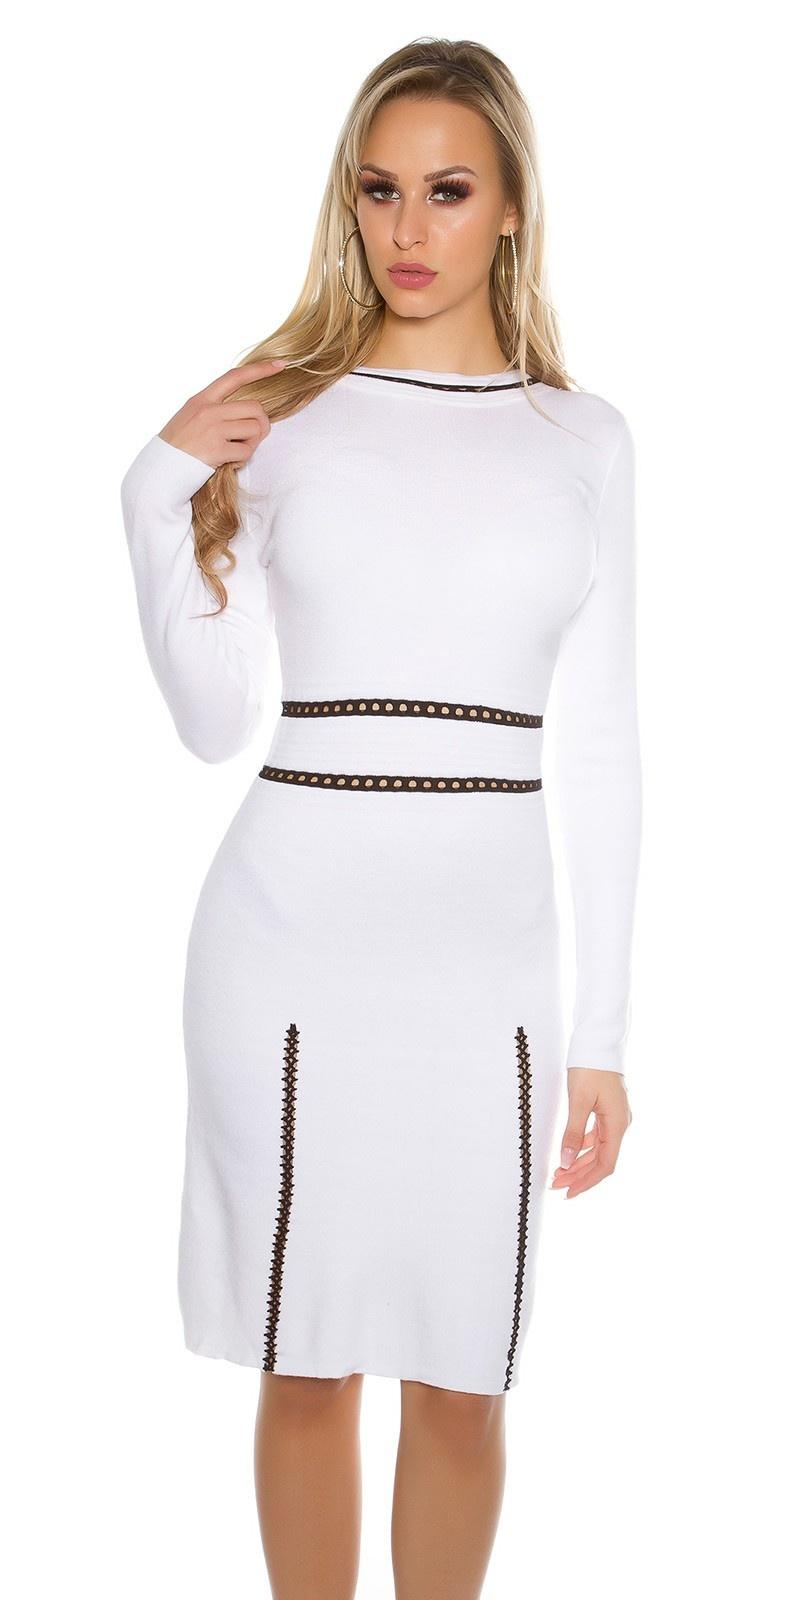 Sexy fijn gebreide jurk lange mouw wit